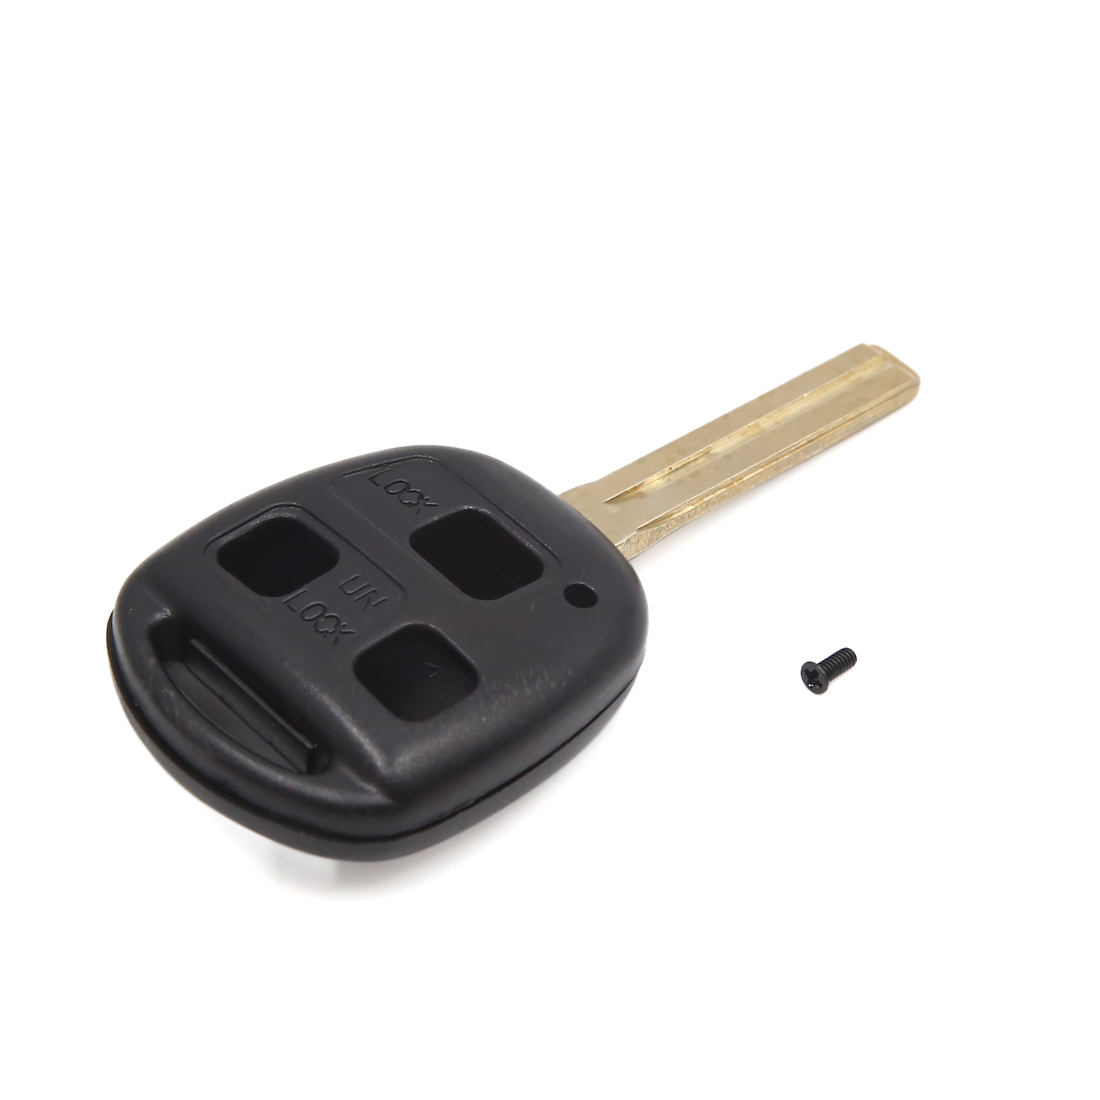 Black 3 Buttons Uncut Key Car Remote Control Case Fob Clicker Shell for Lexus